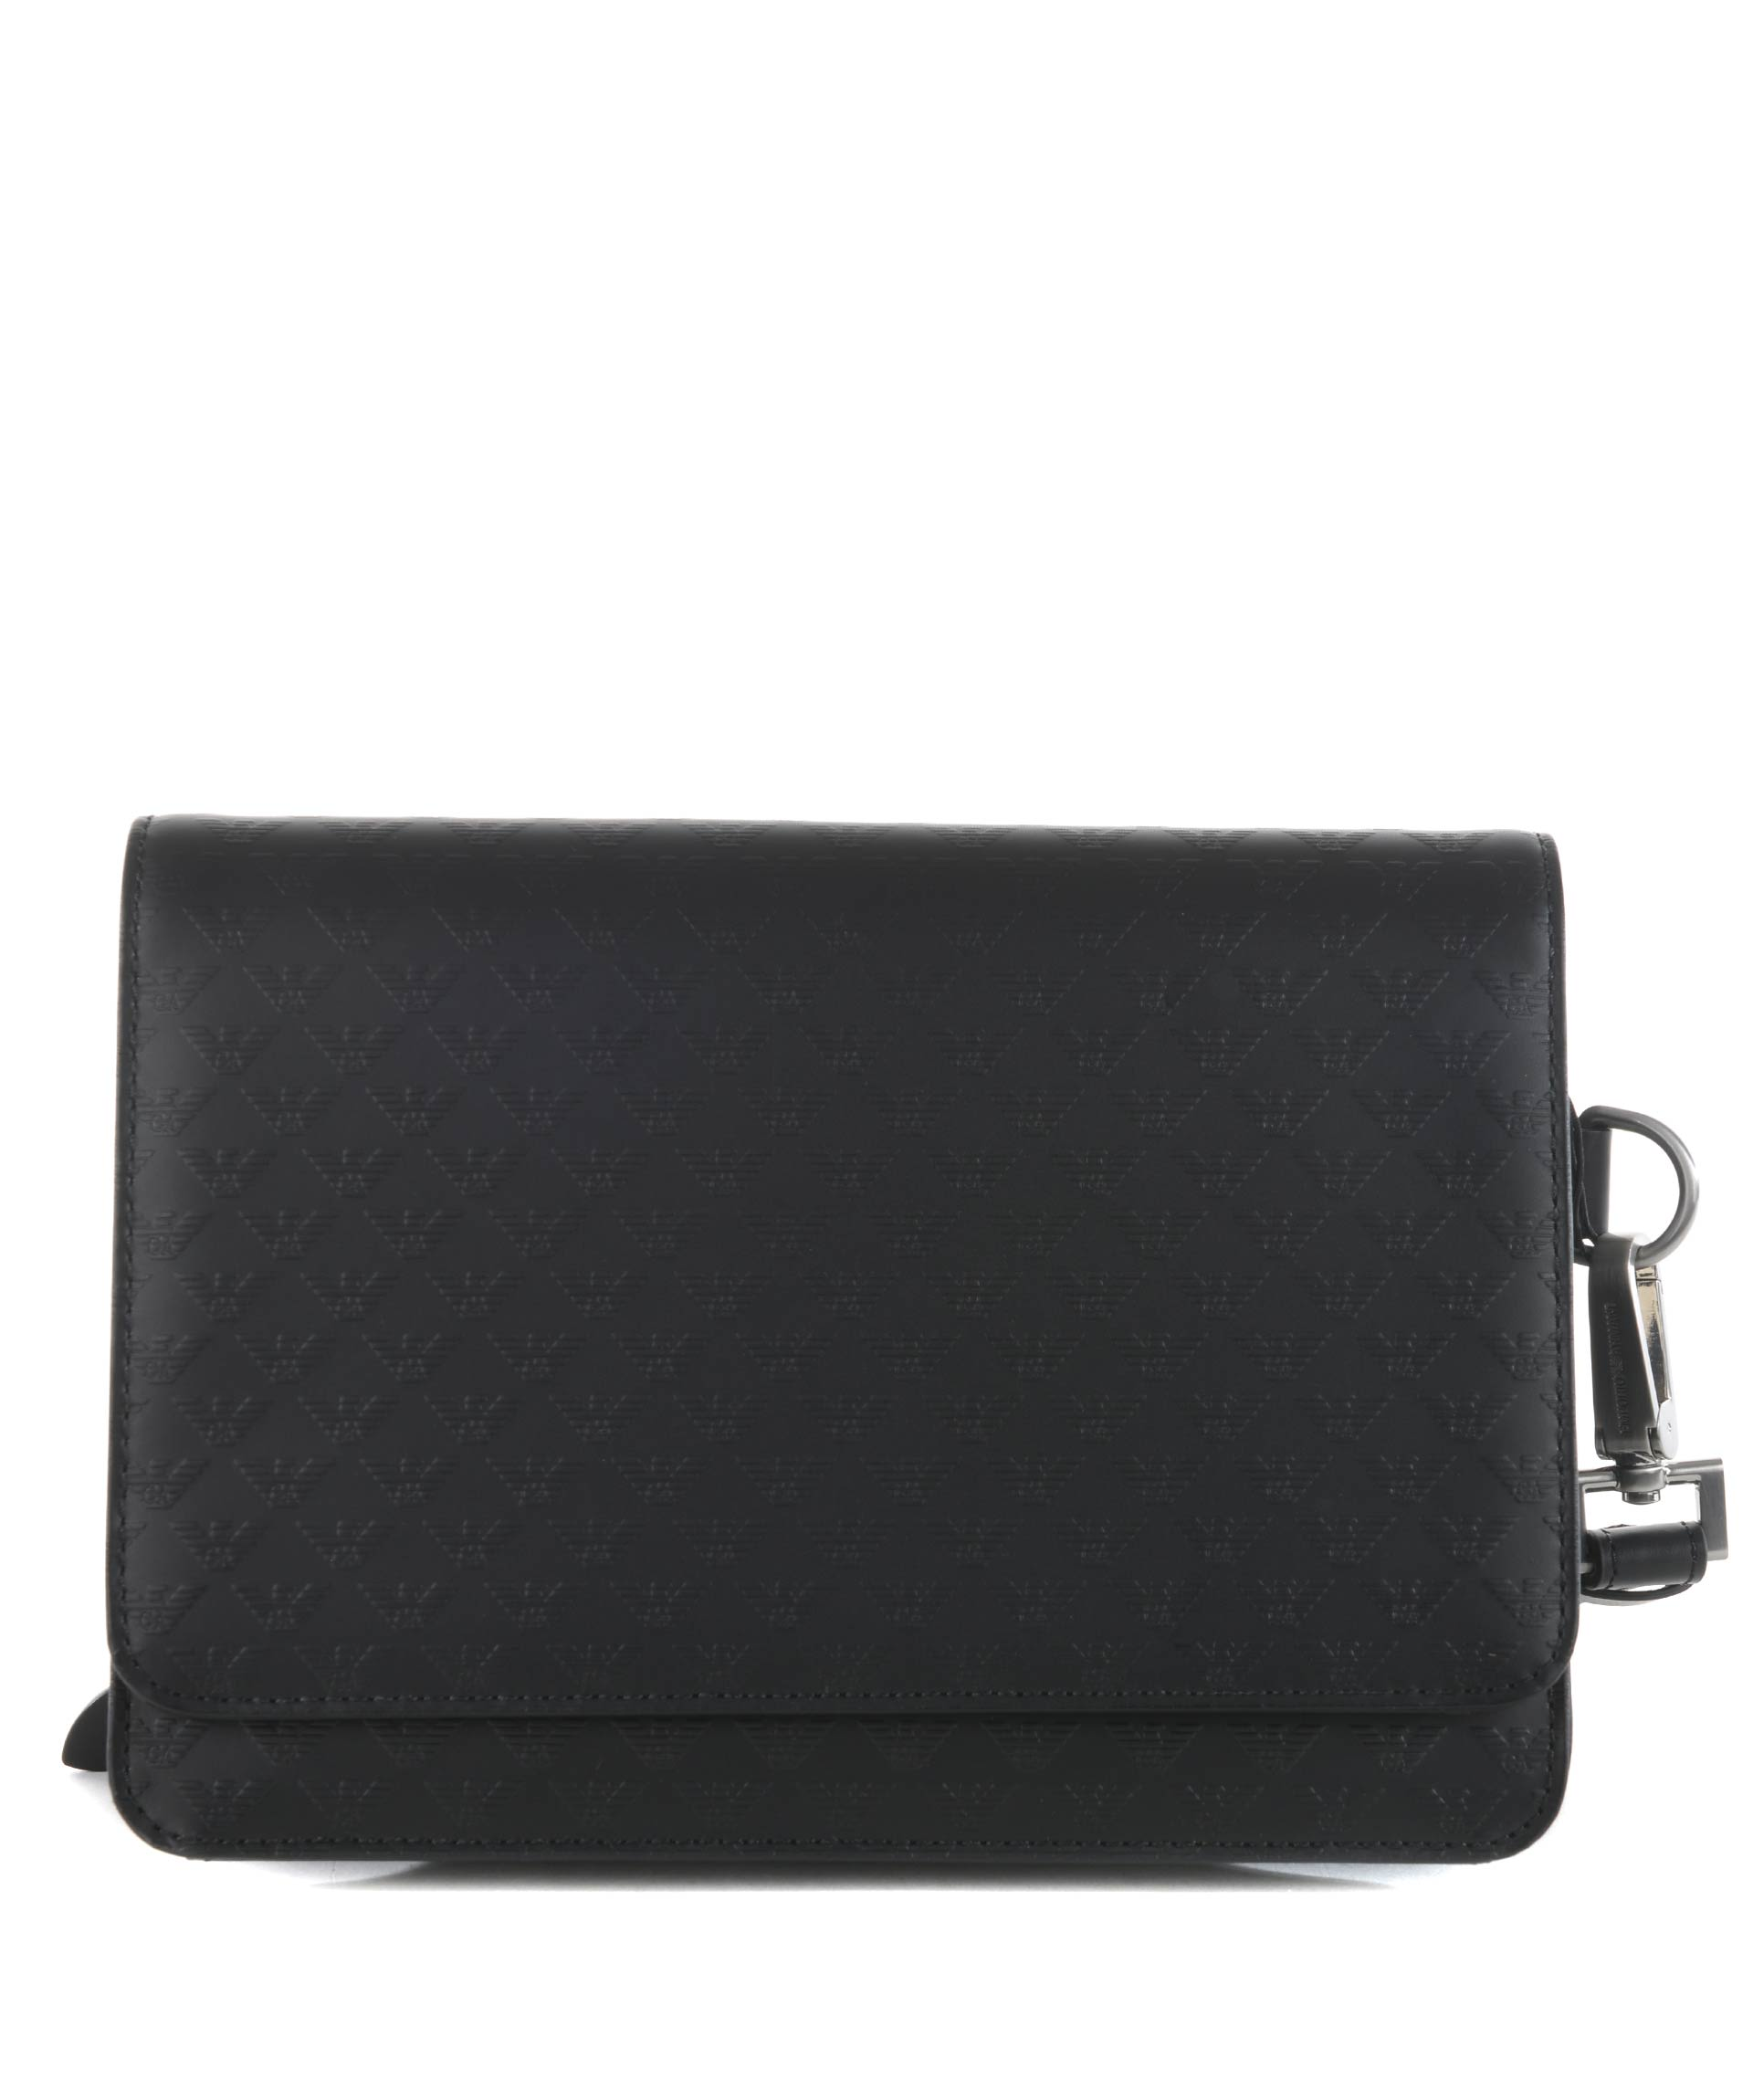 Emporio Armani Leather Clutch